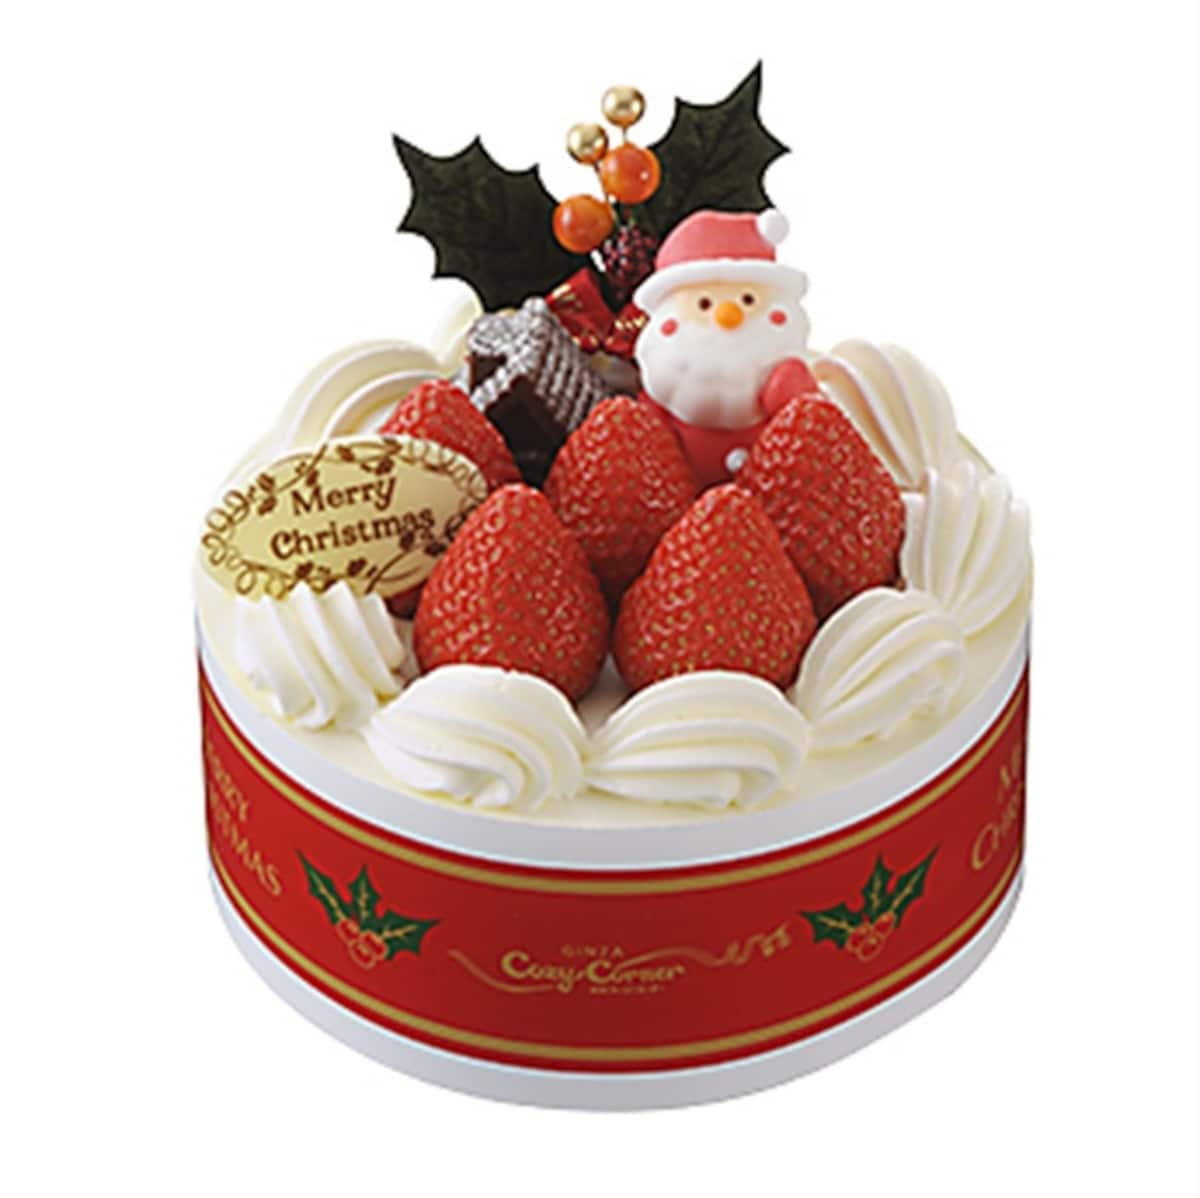 10. Love Strawberry Layer Shortcake (¥2,800)